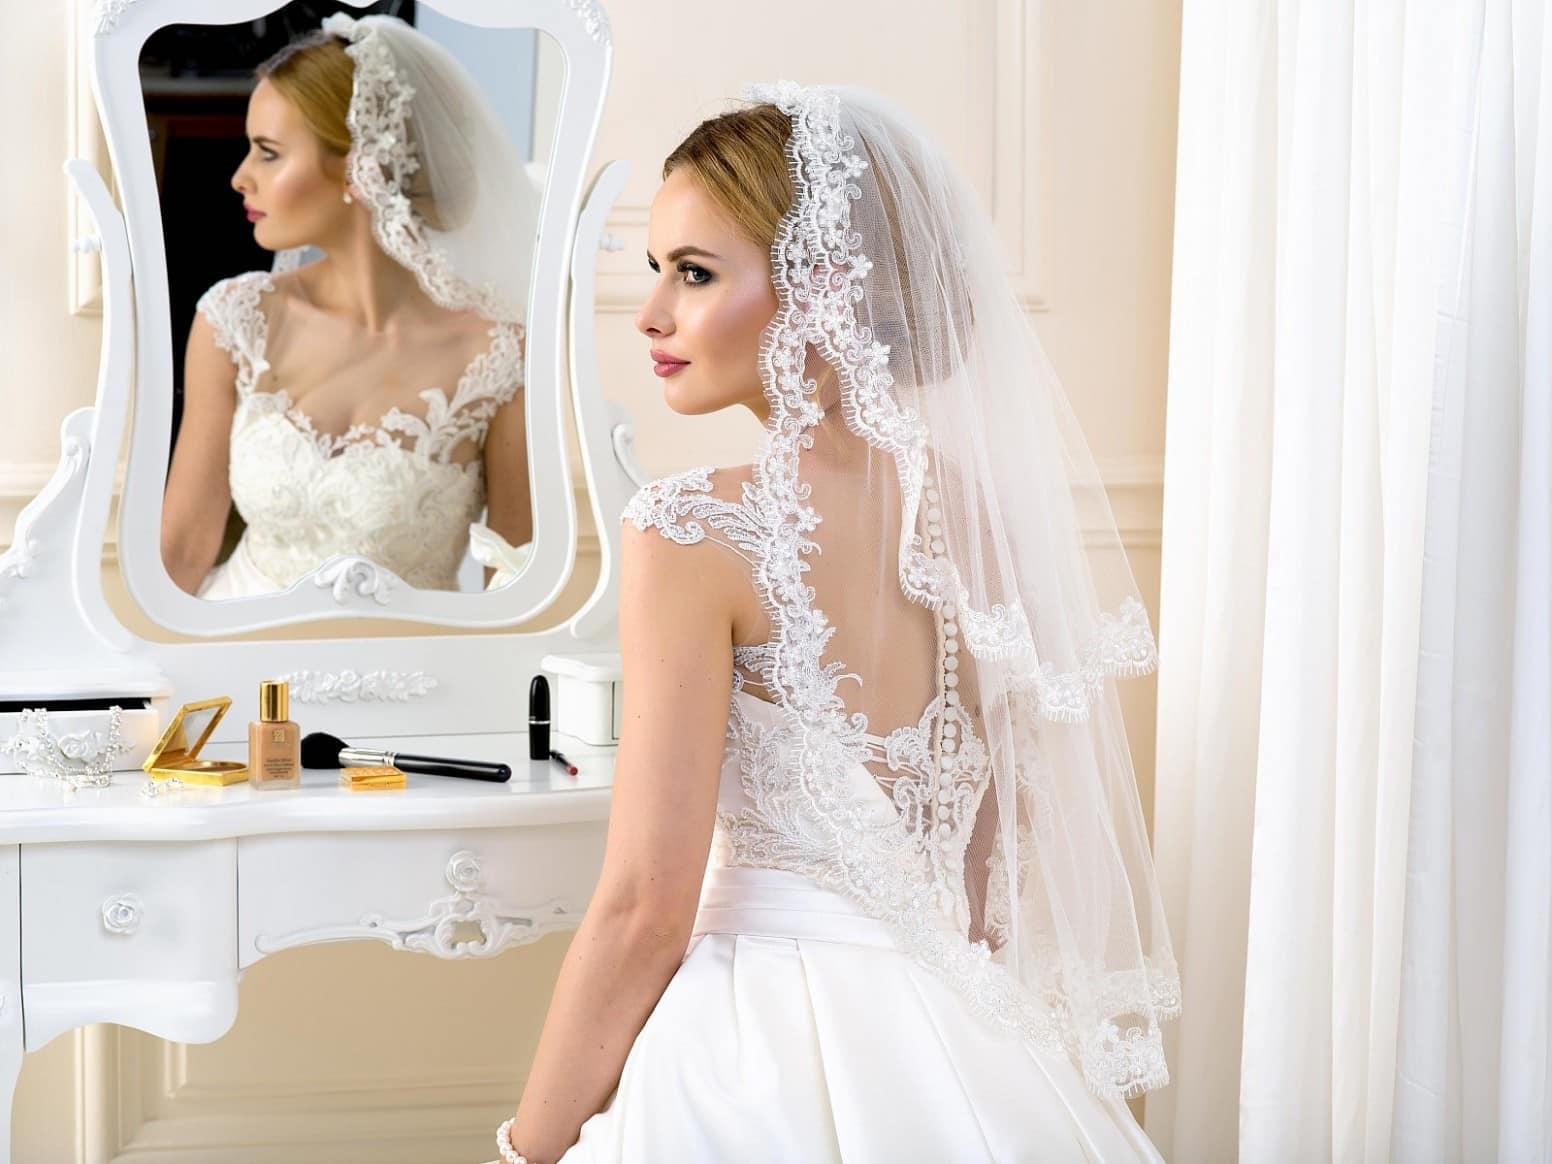 Accessoires de robe de mariage